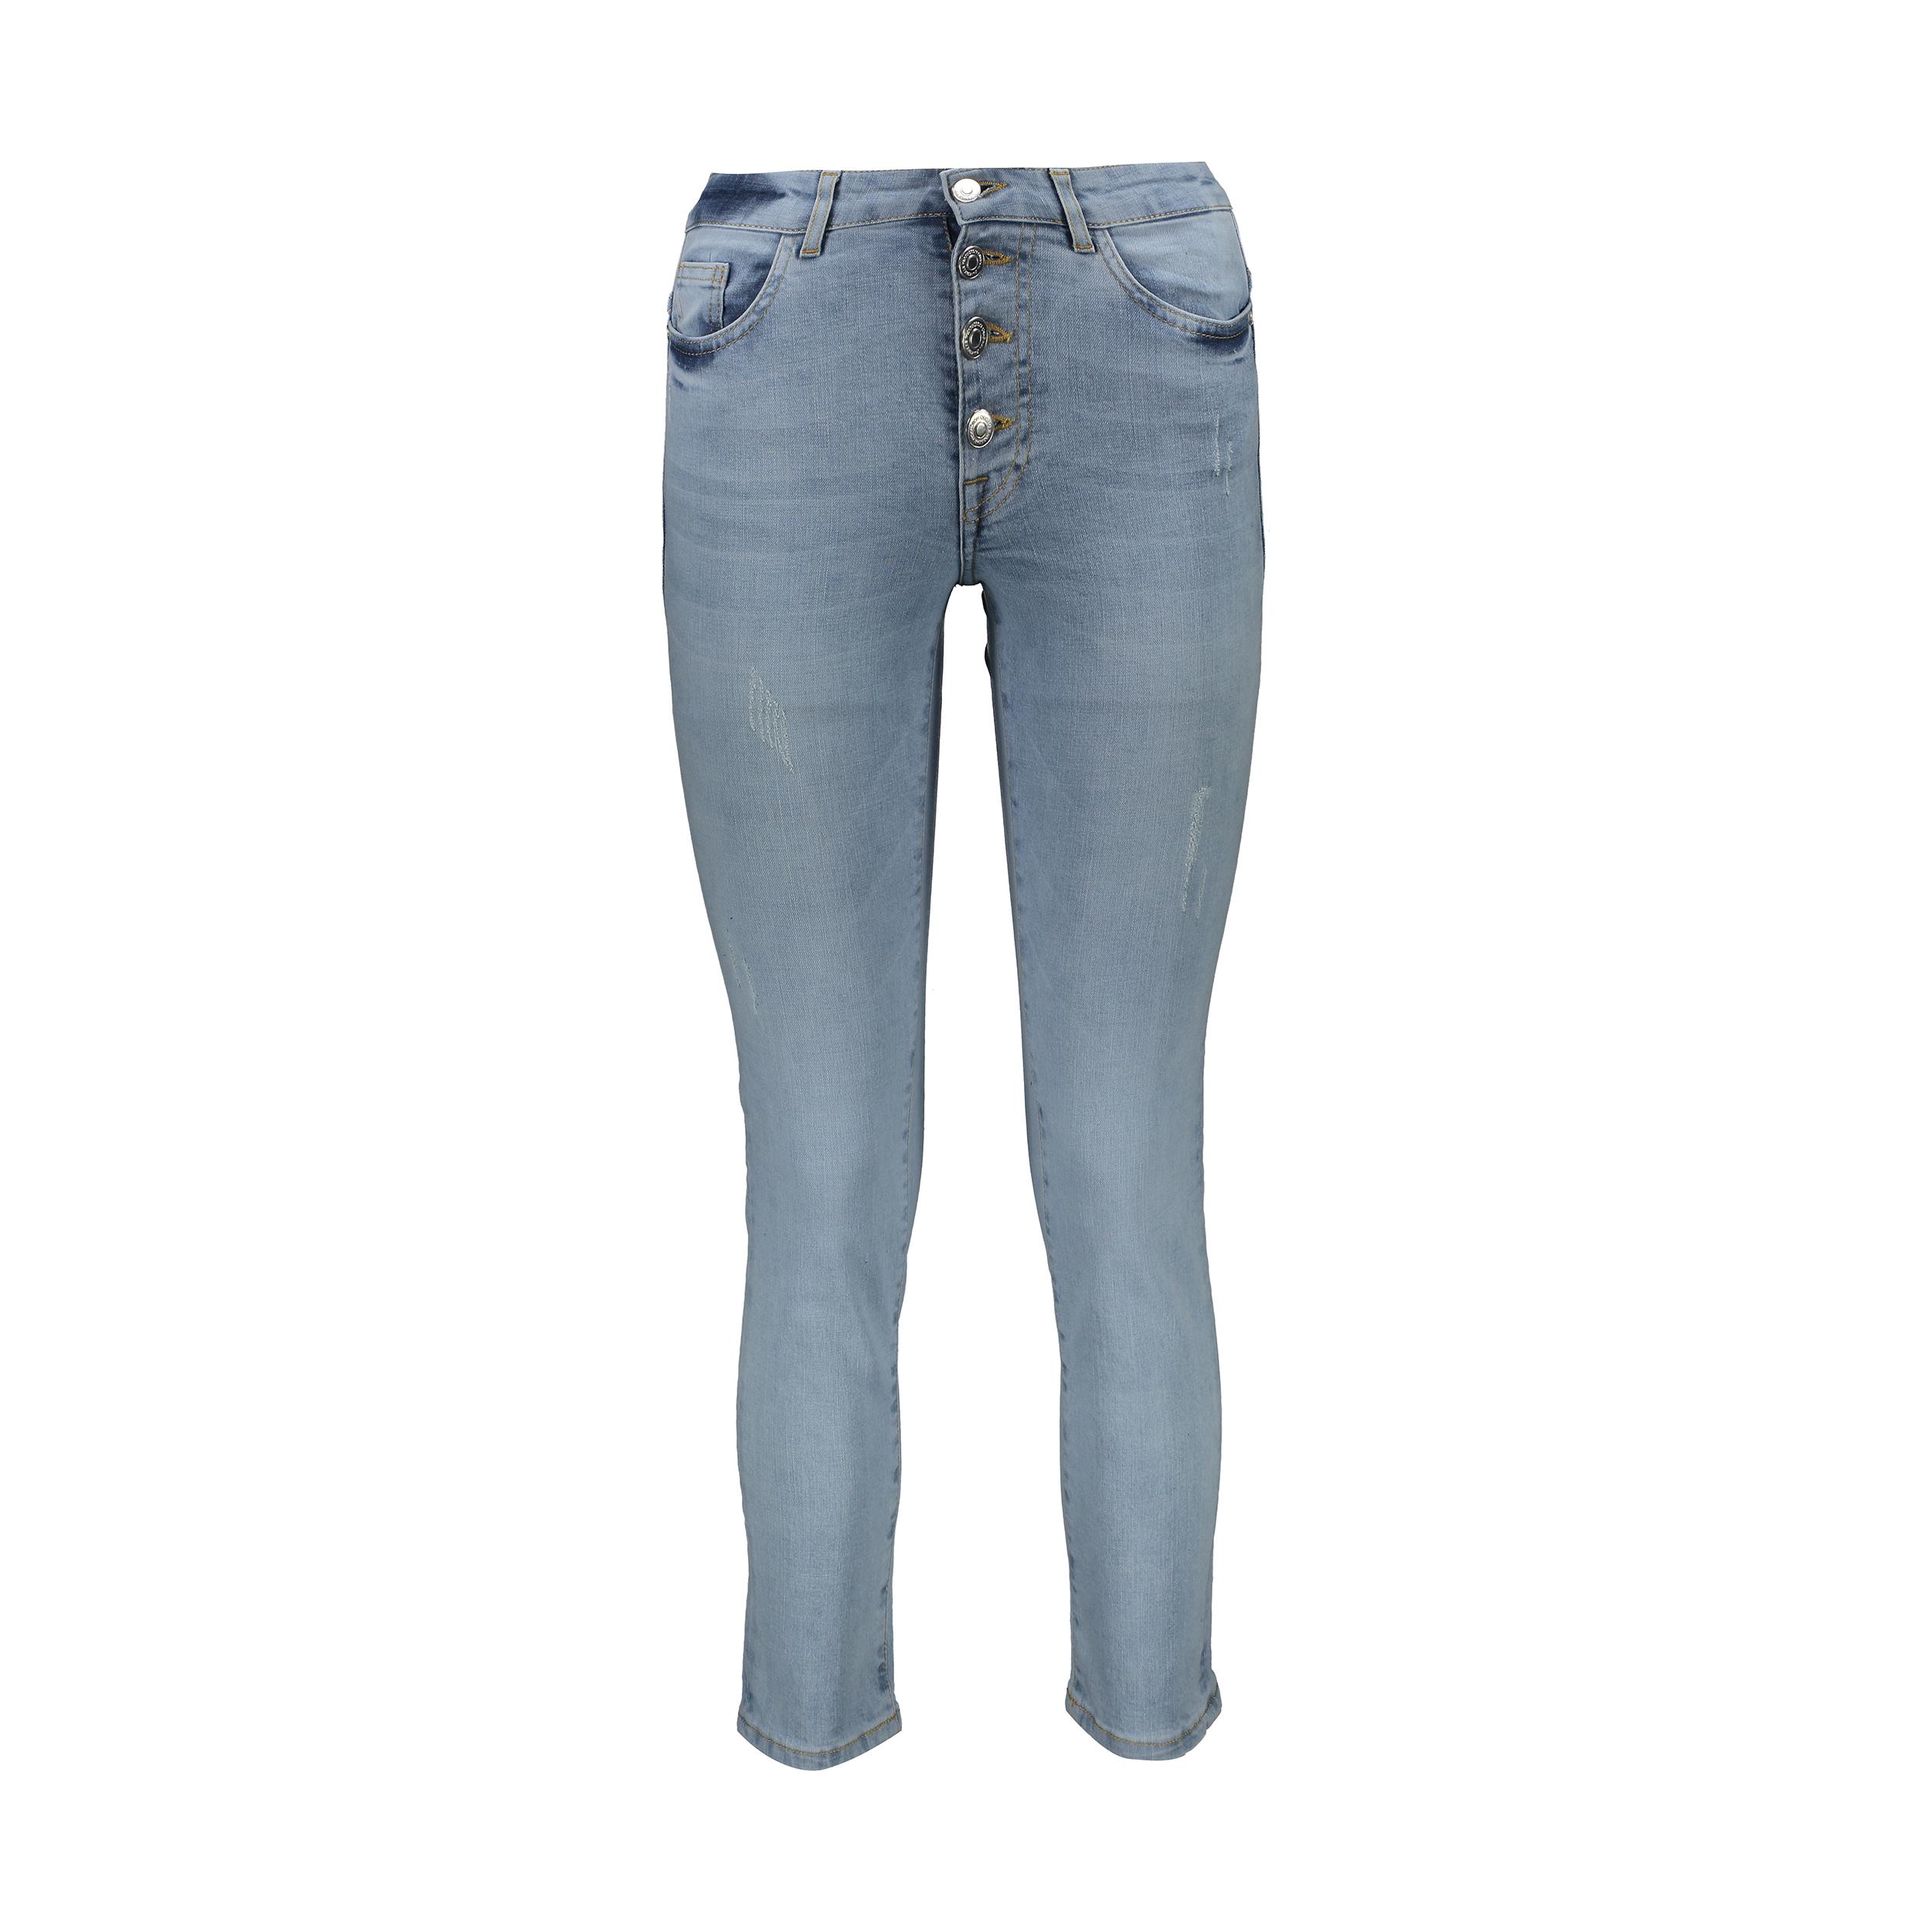 شلوار جین زنانه آر ان اس مدل 1104075-58